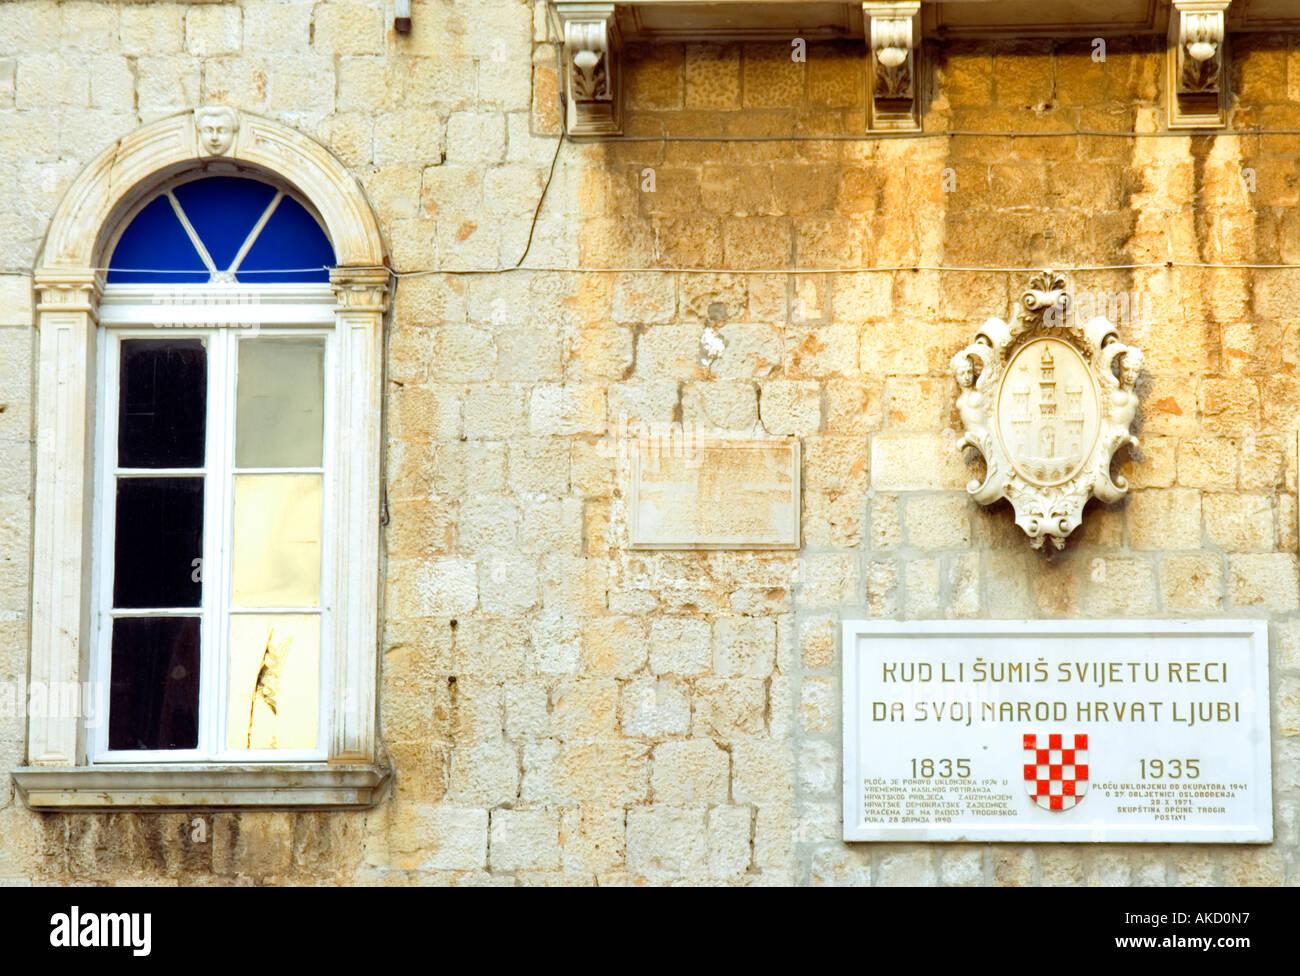 South-East Europe, Croatia, Dalmatia, Trogir, arched window and ...